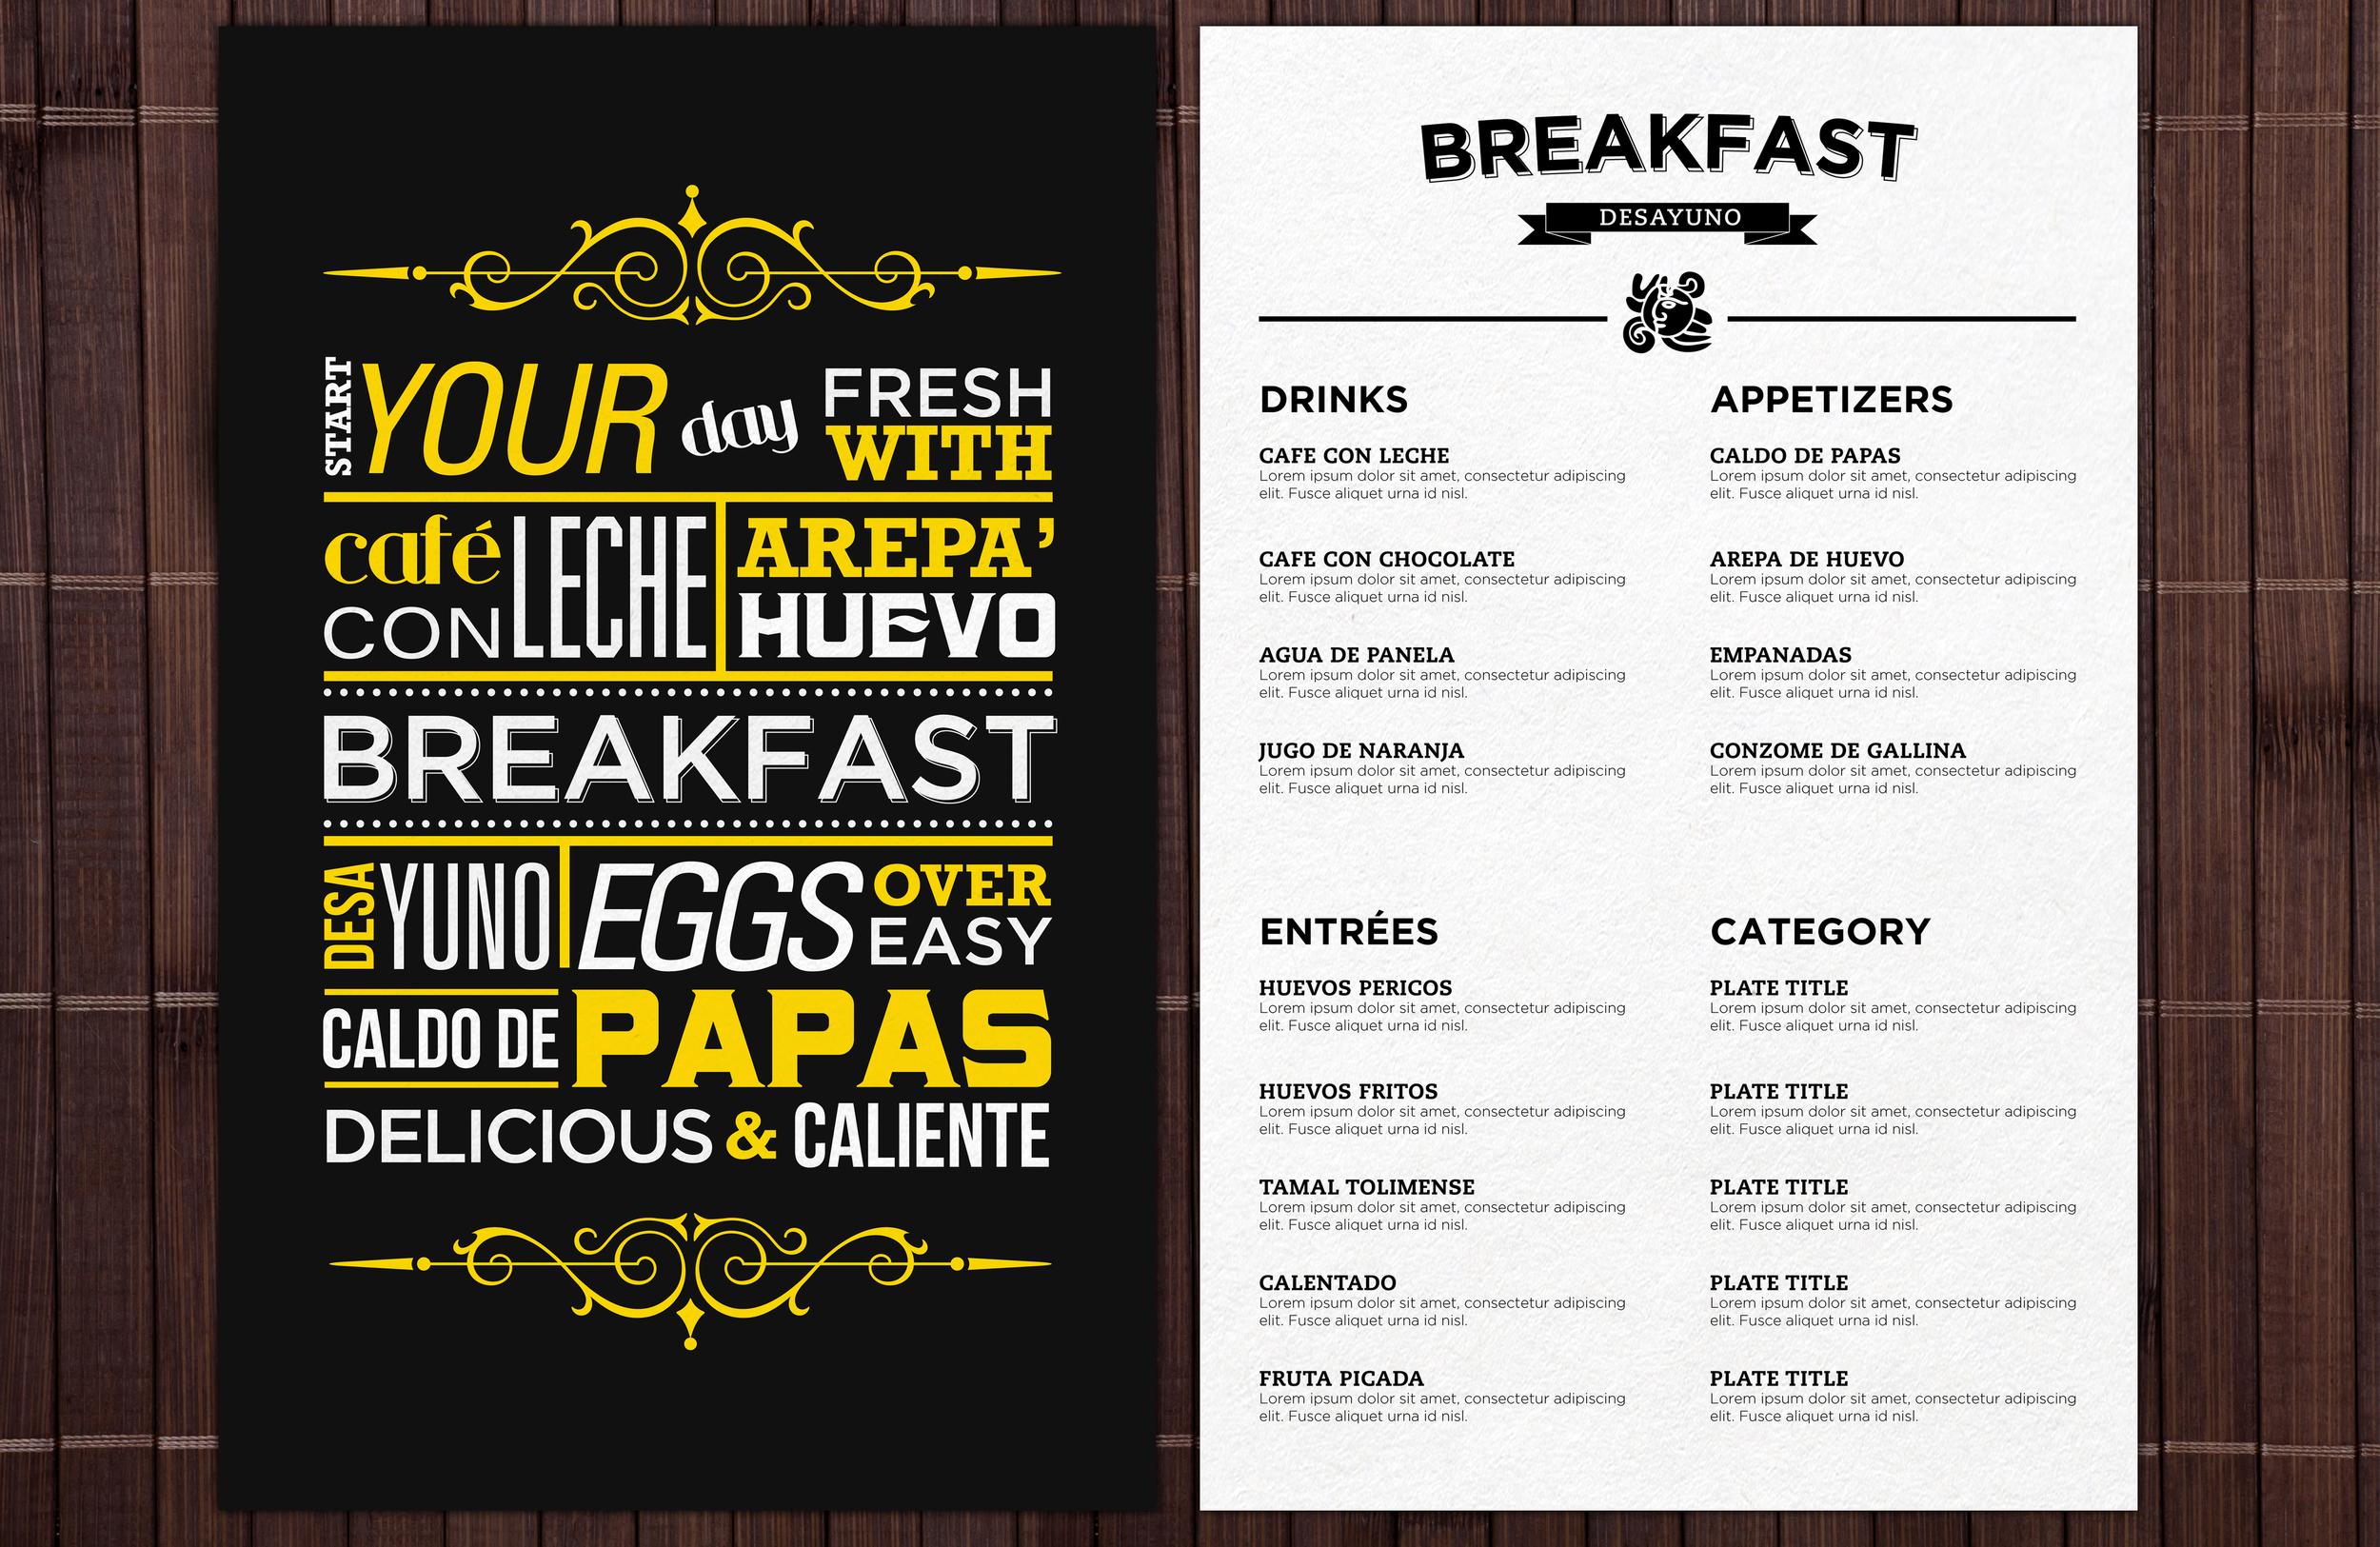 menubreakfastrender.jpg